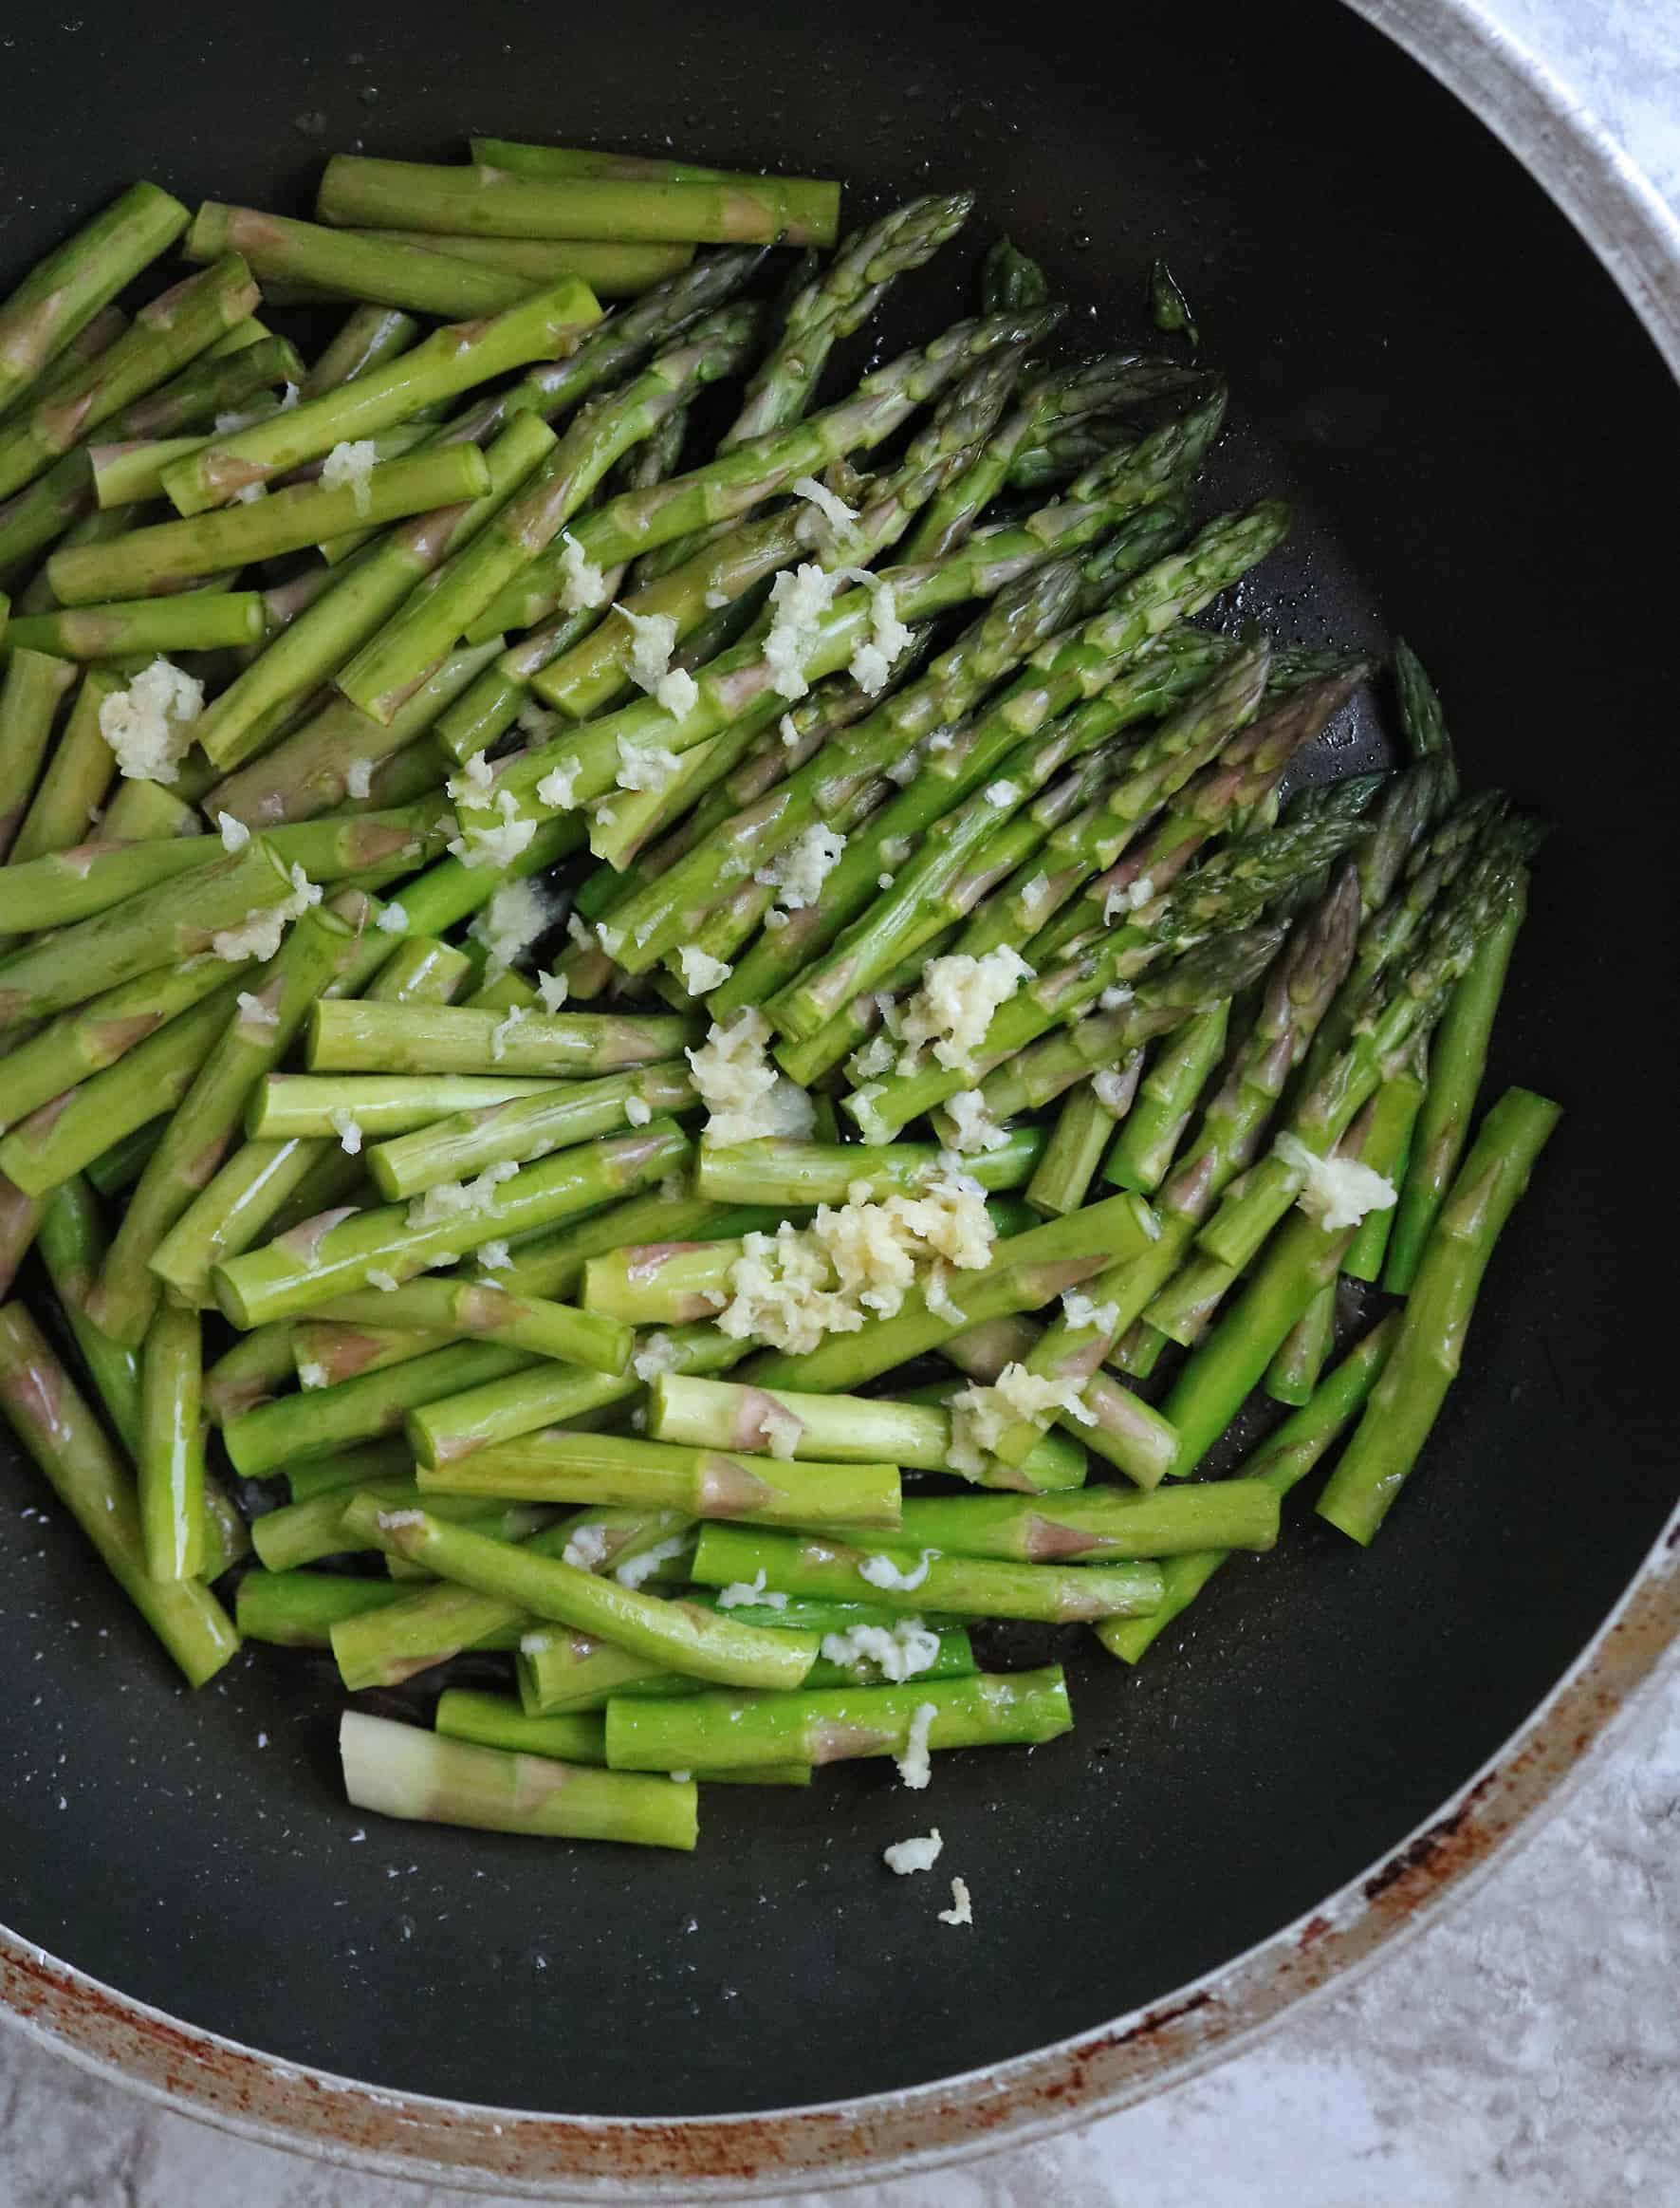 Cooking Garlic asparagus